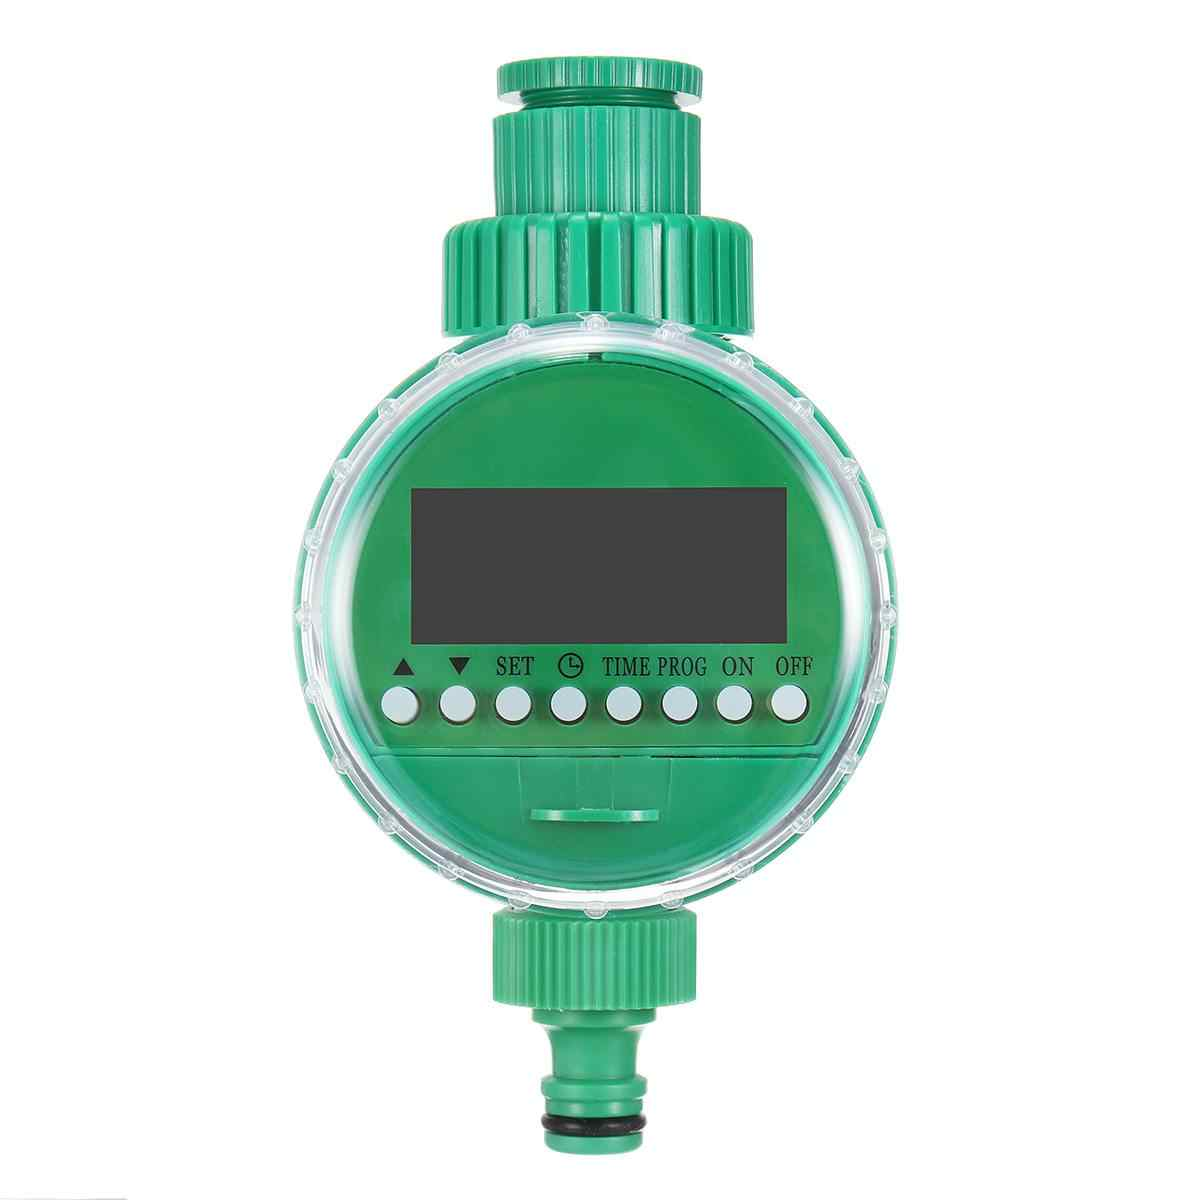 25M Micro หยดระบบชลประทาน Automatic Water Timer วาล์ว Smart Controller รดน้ำสวน Electrinic ปรับ Dripper